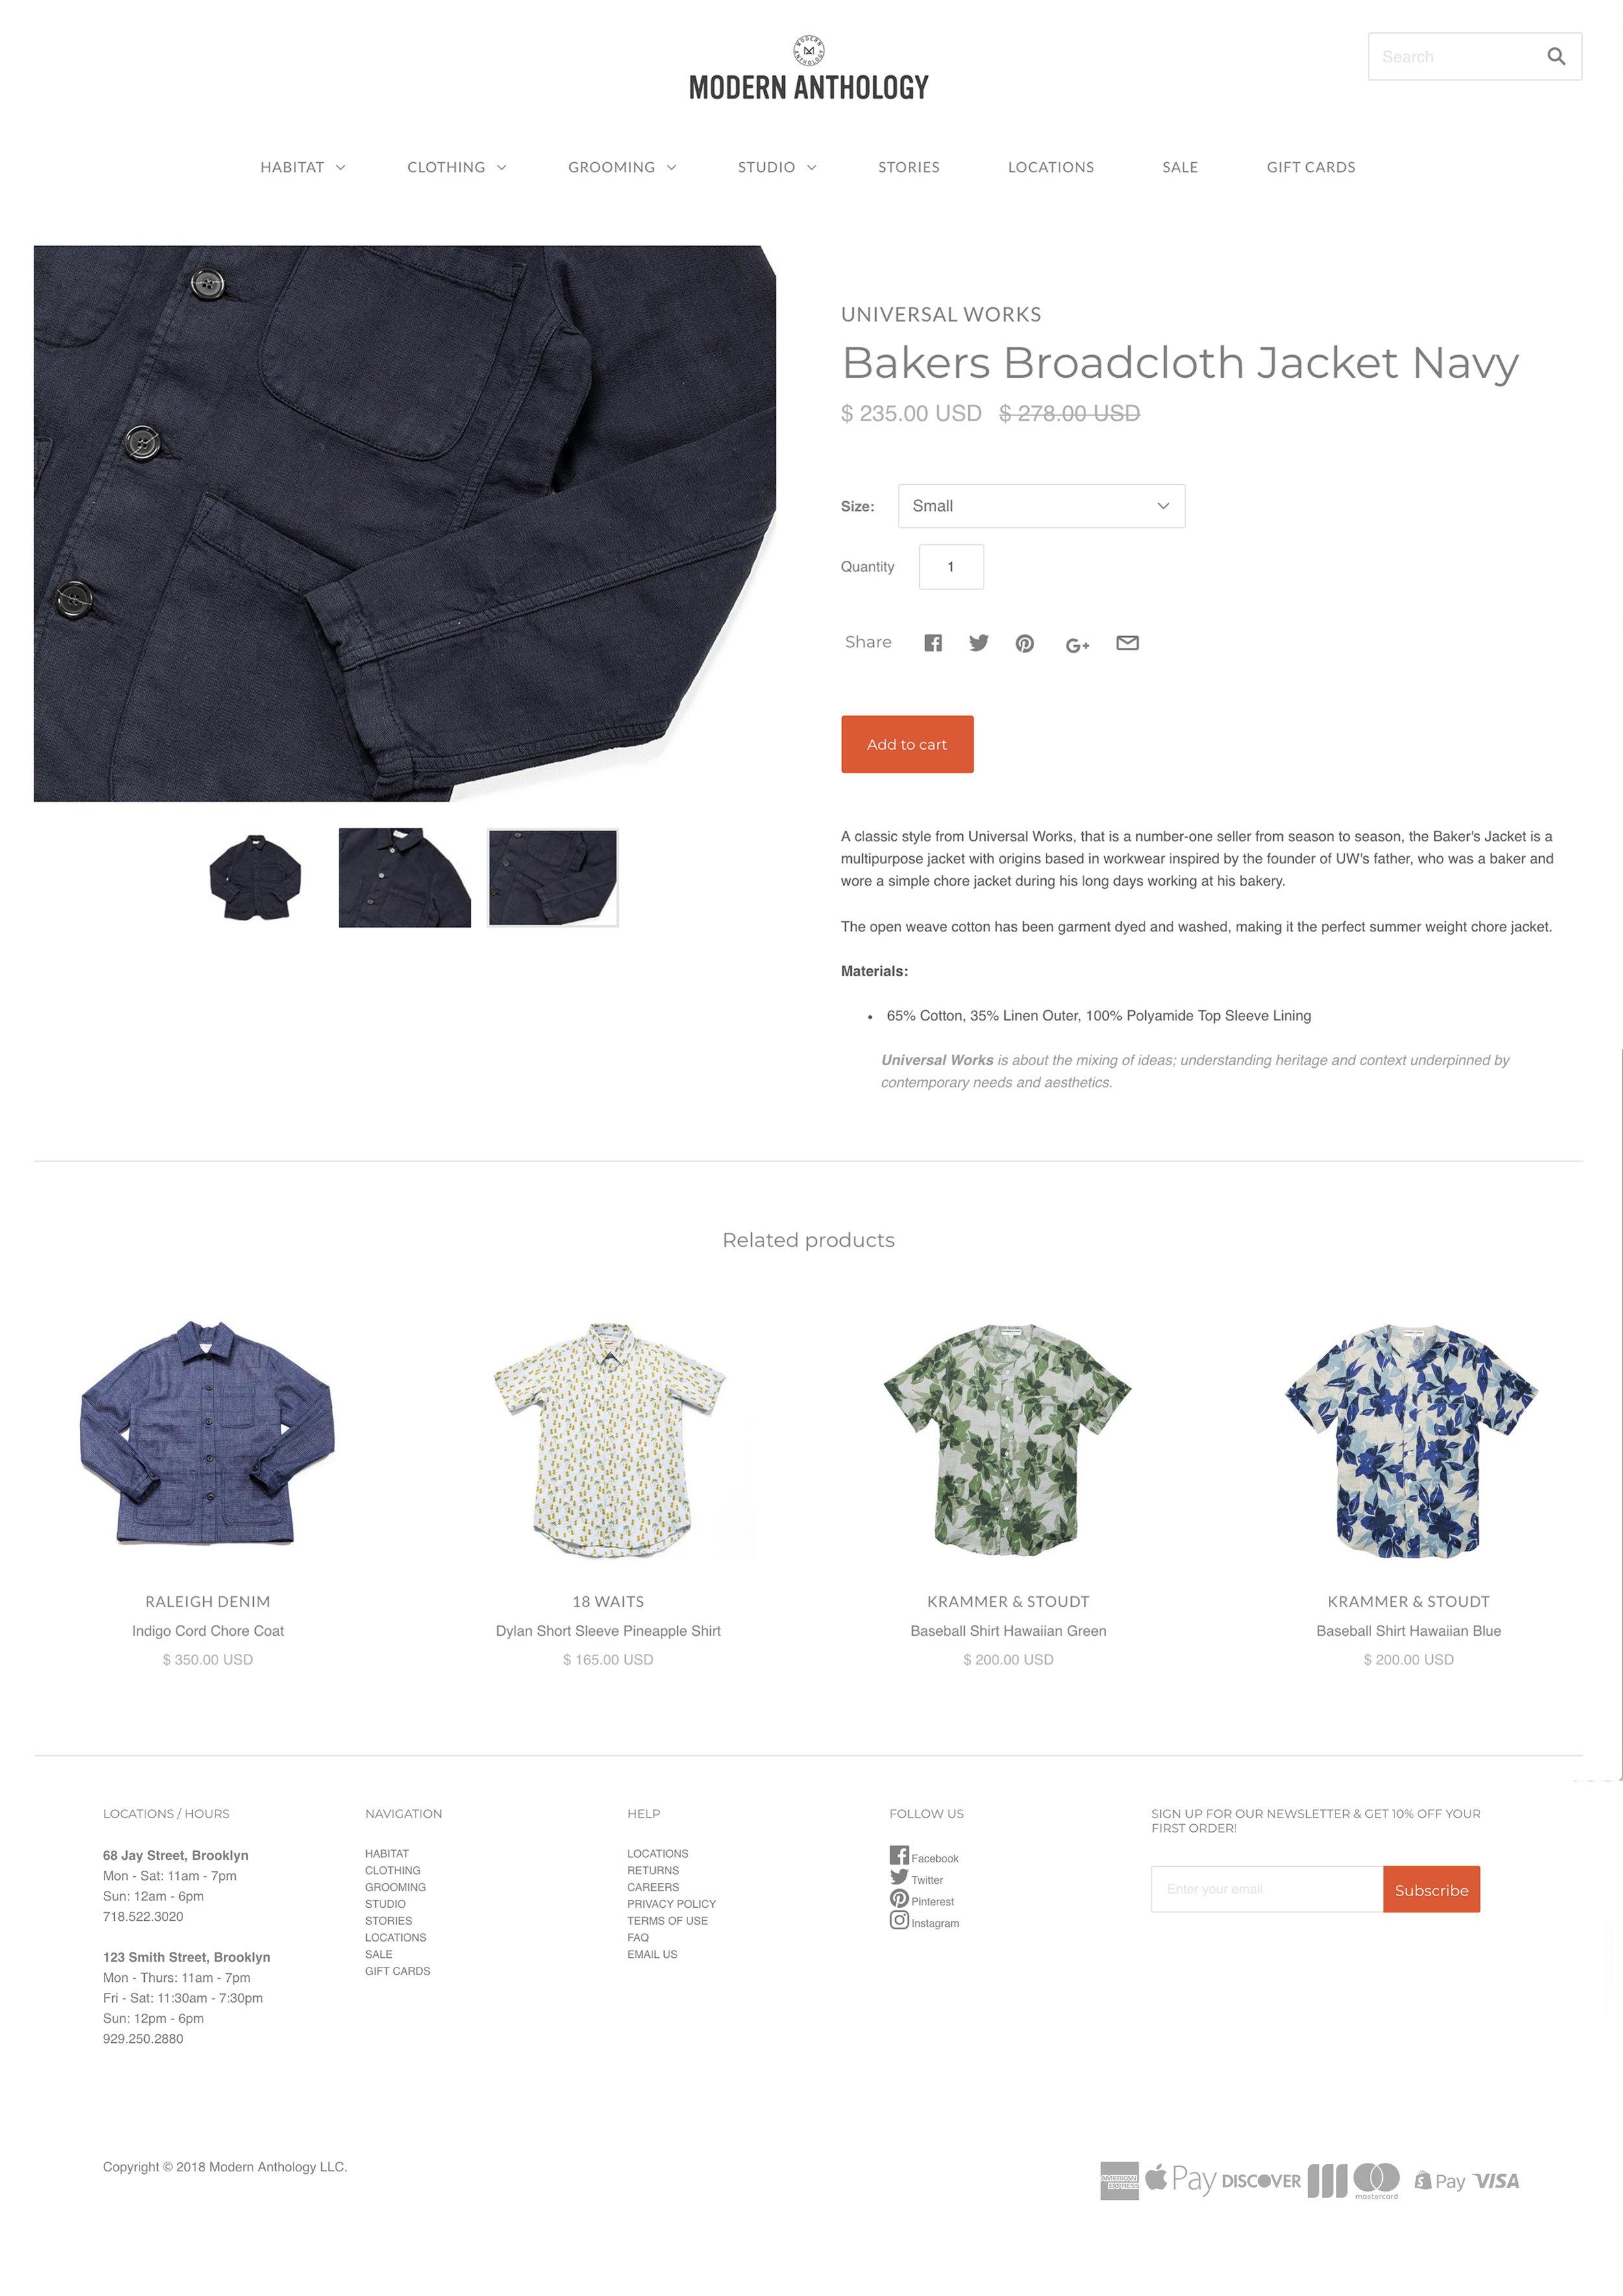 Billy_gonzalez_Portfoloi_website_Clothing_02.jpg